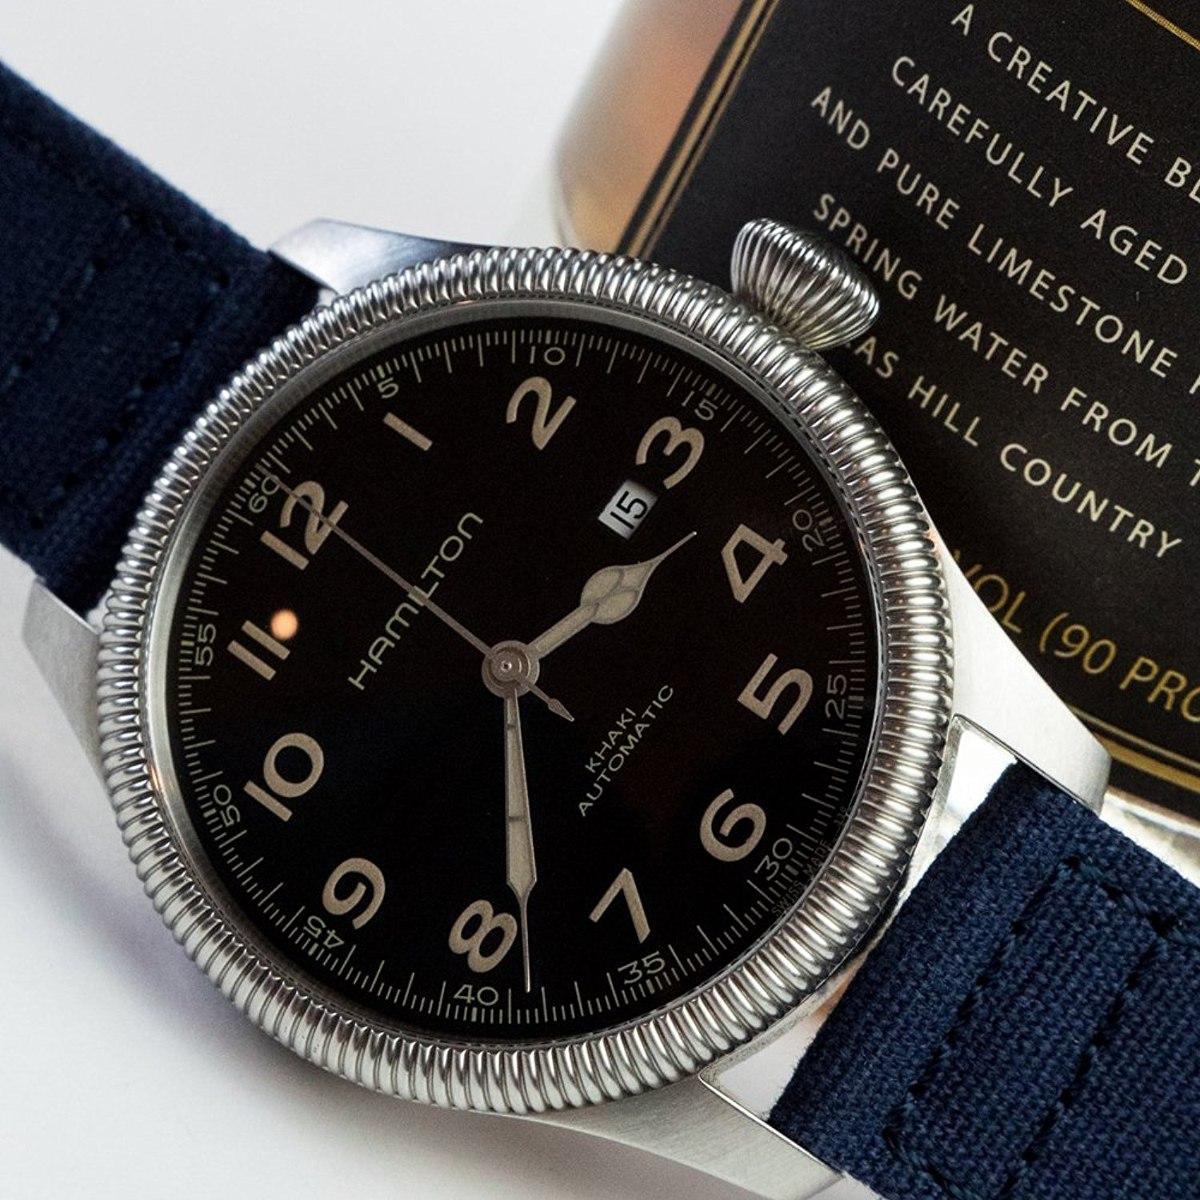 barton correas para reloj de pulsera de tela ... 1104fdbe7b51